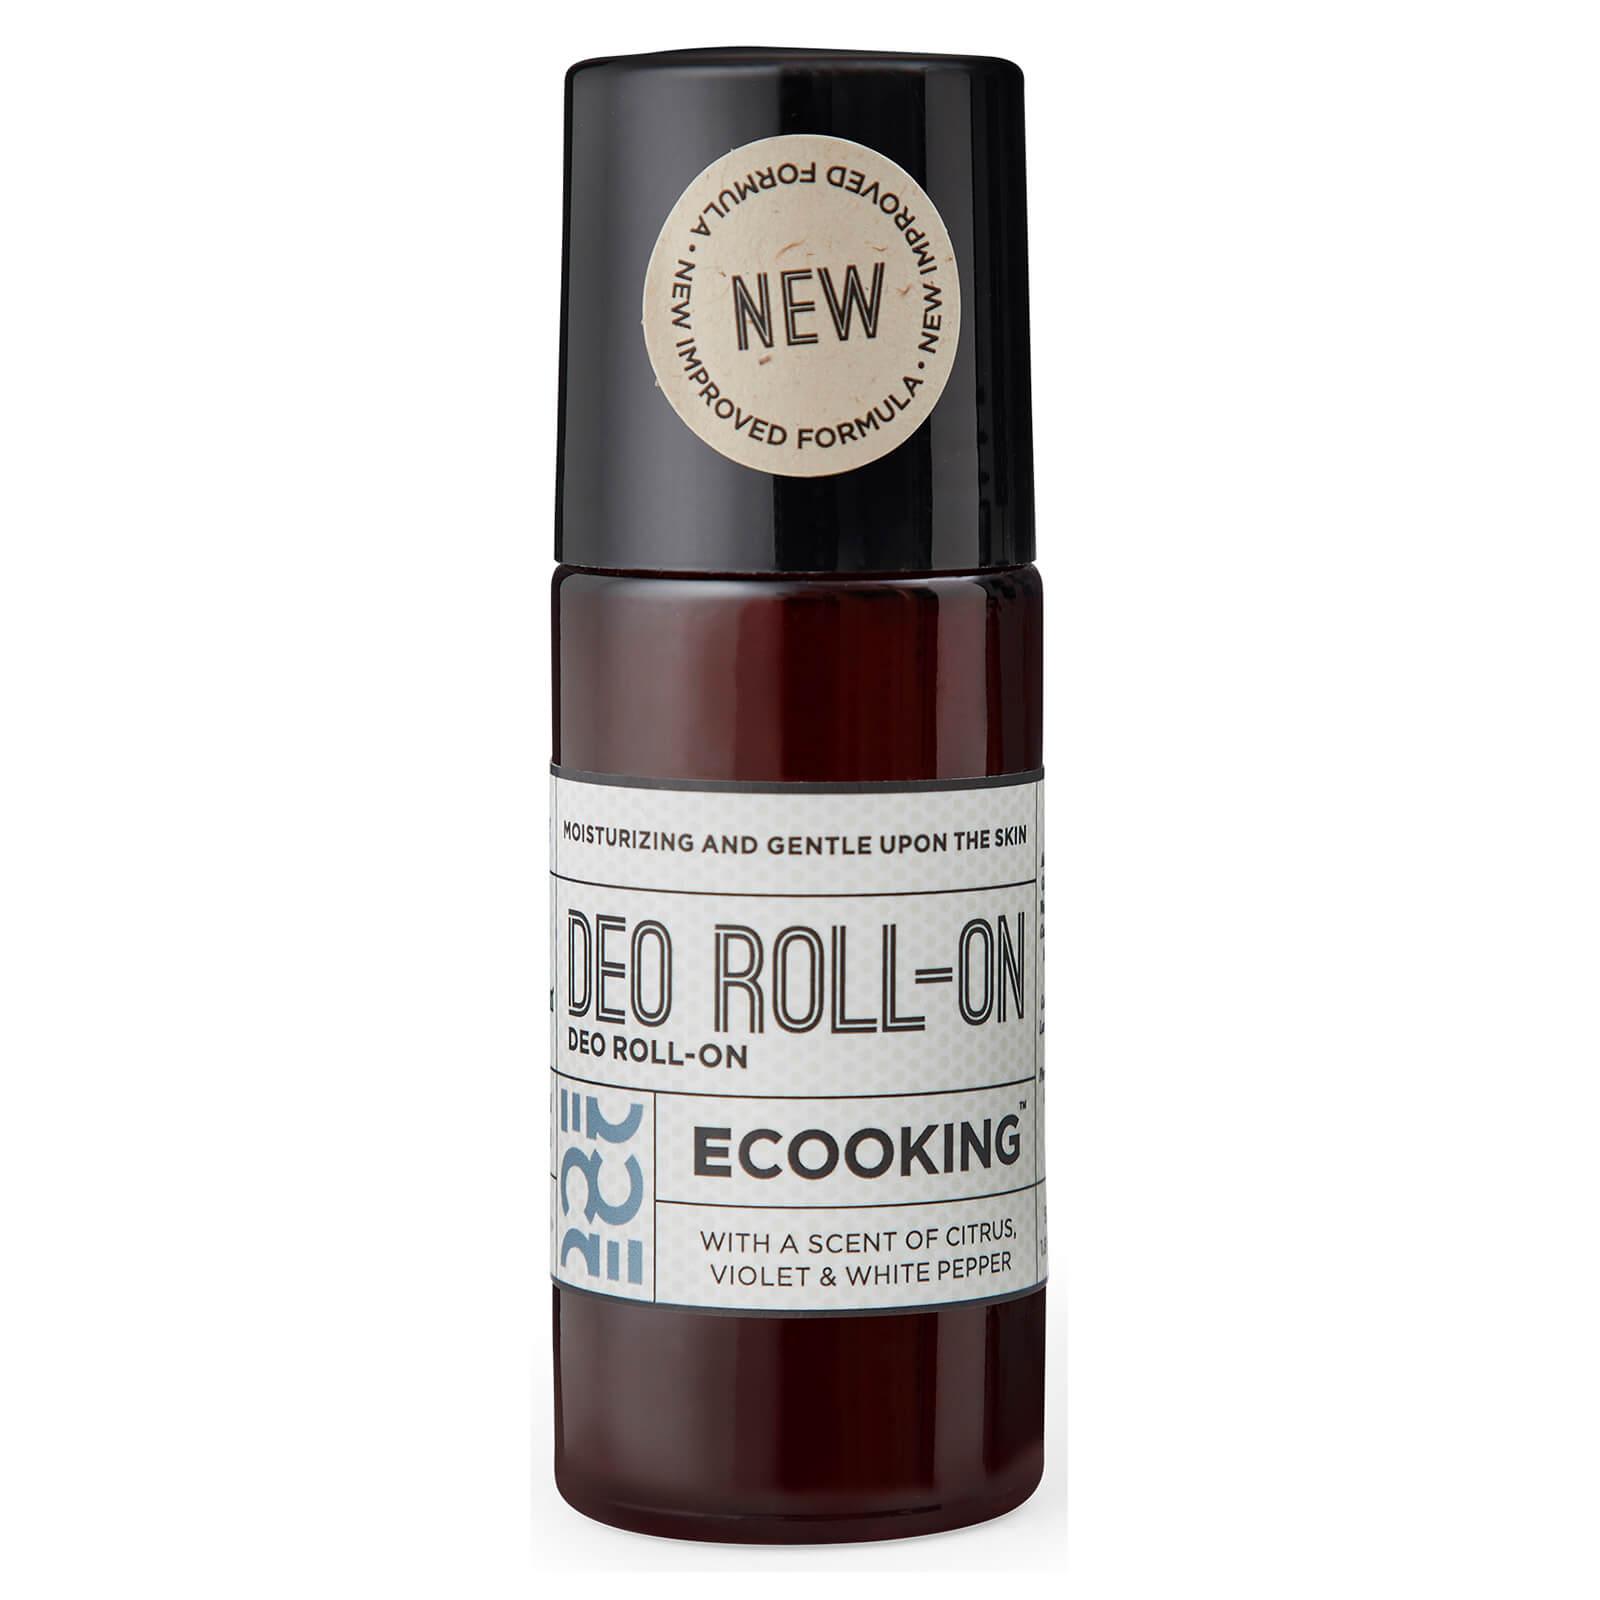 Купить Ecooking Roll-on Deodorant 50ml